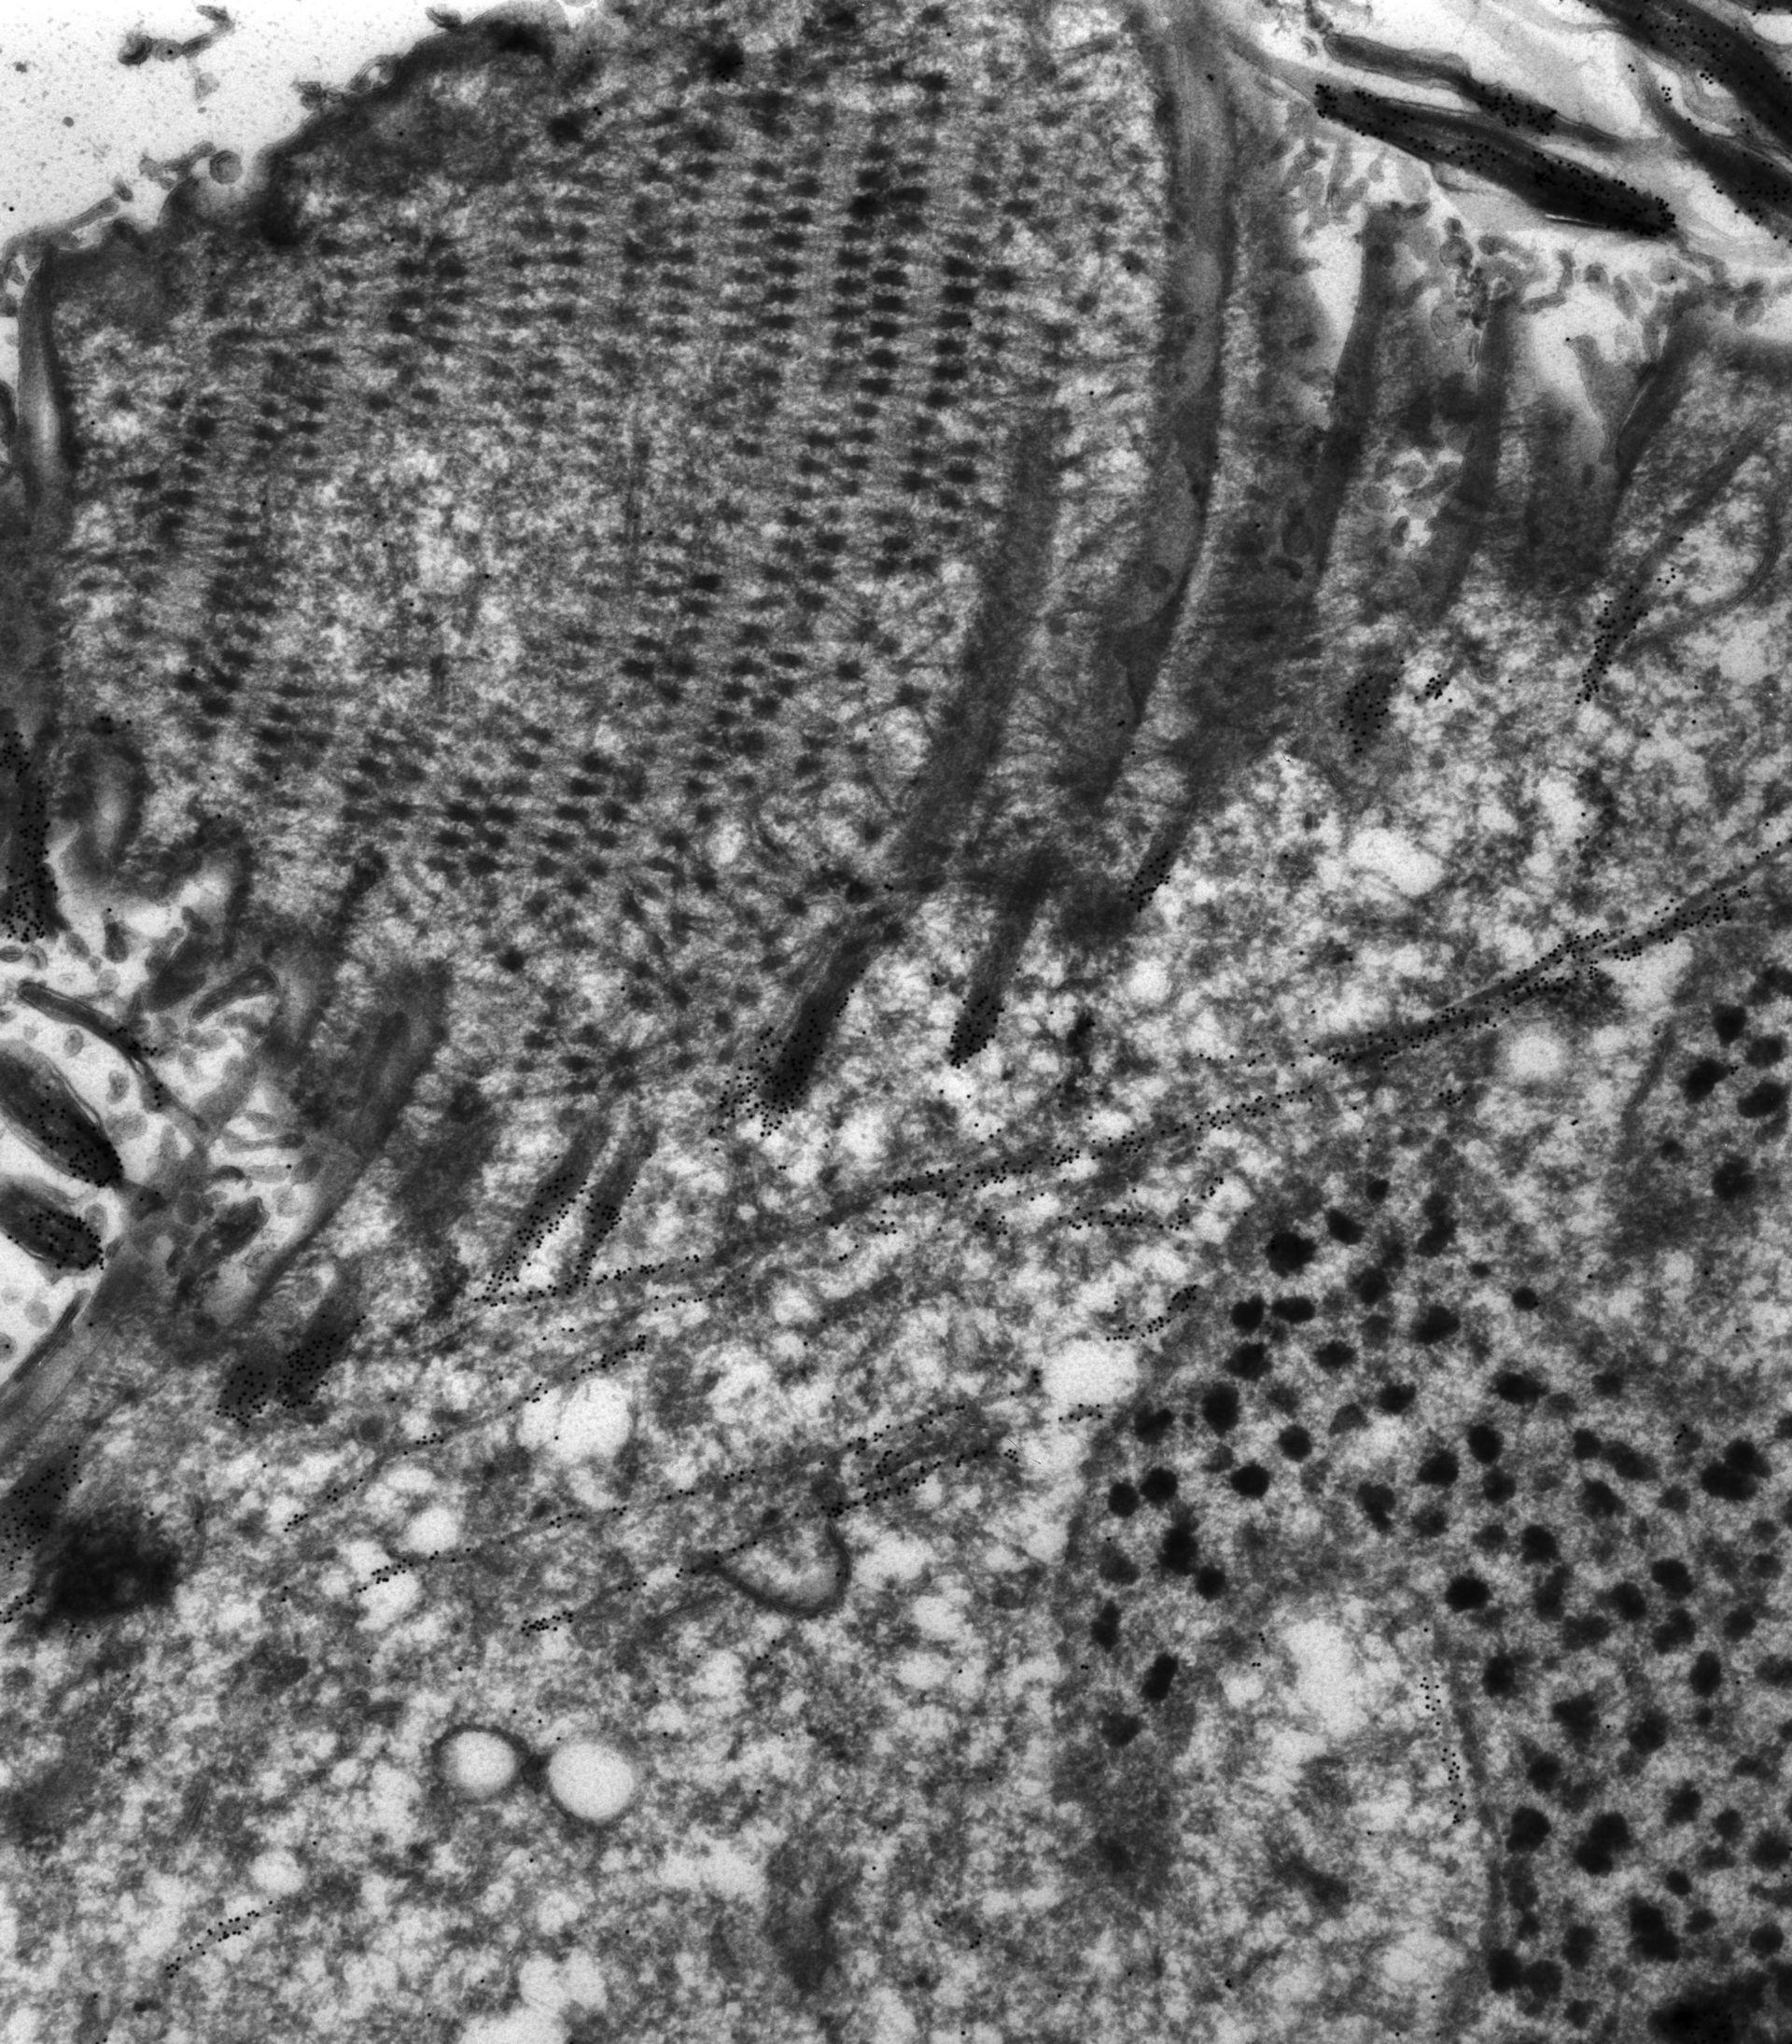 Paramecium tetraurelia (macronucleo) - CIL:12075